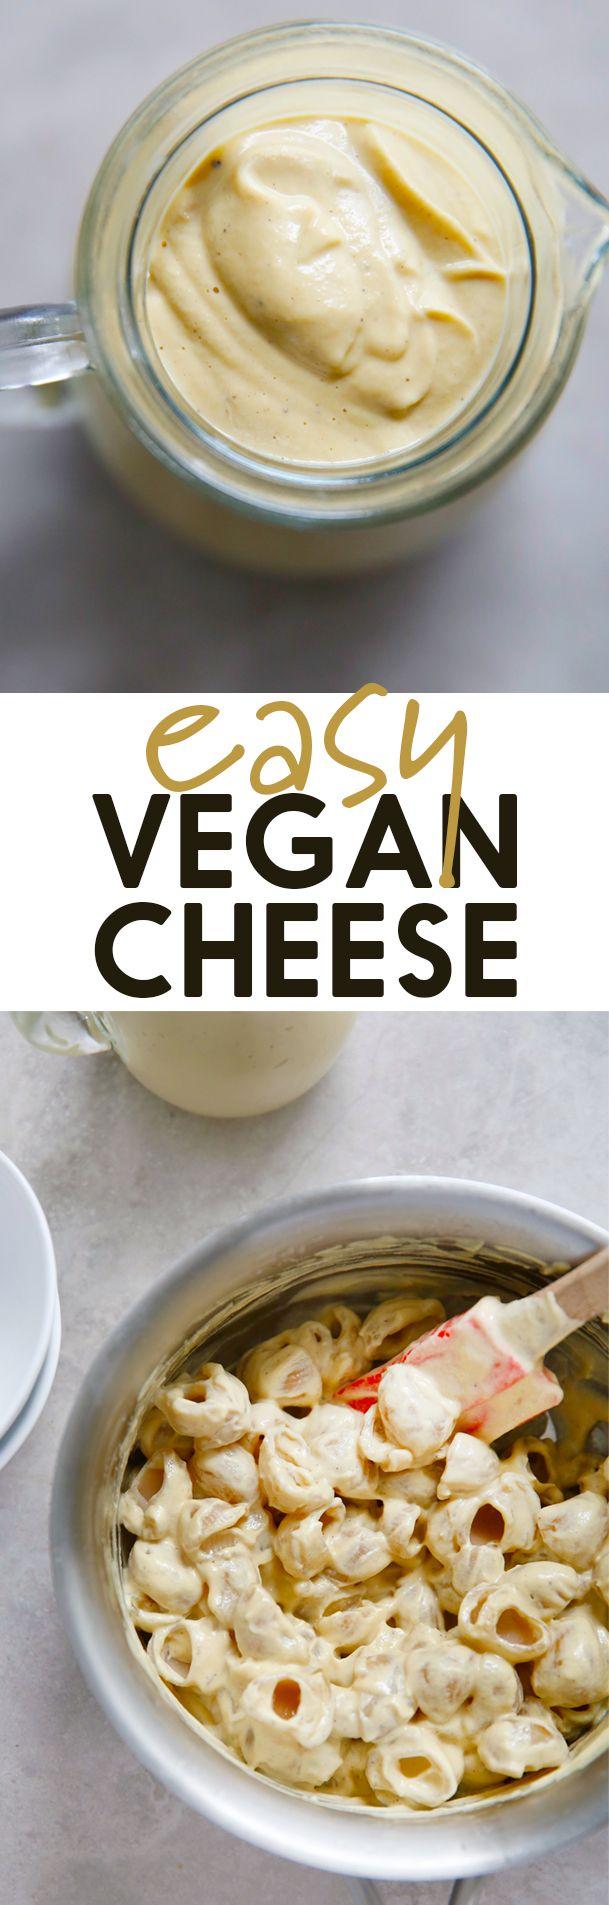 How To Make Vegan Cheese Sauce Lexi S Clean Kitchen Recipe Vegan Cheese Sauce Vegan Cheese Recipes Vegan Cheese